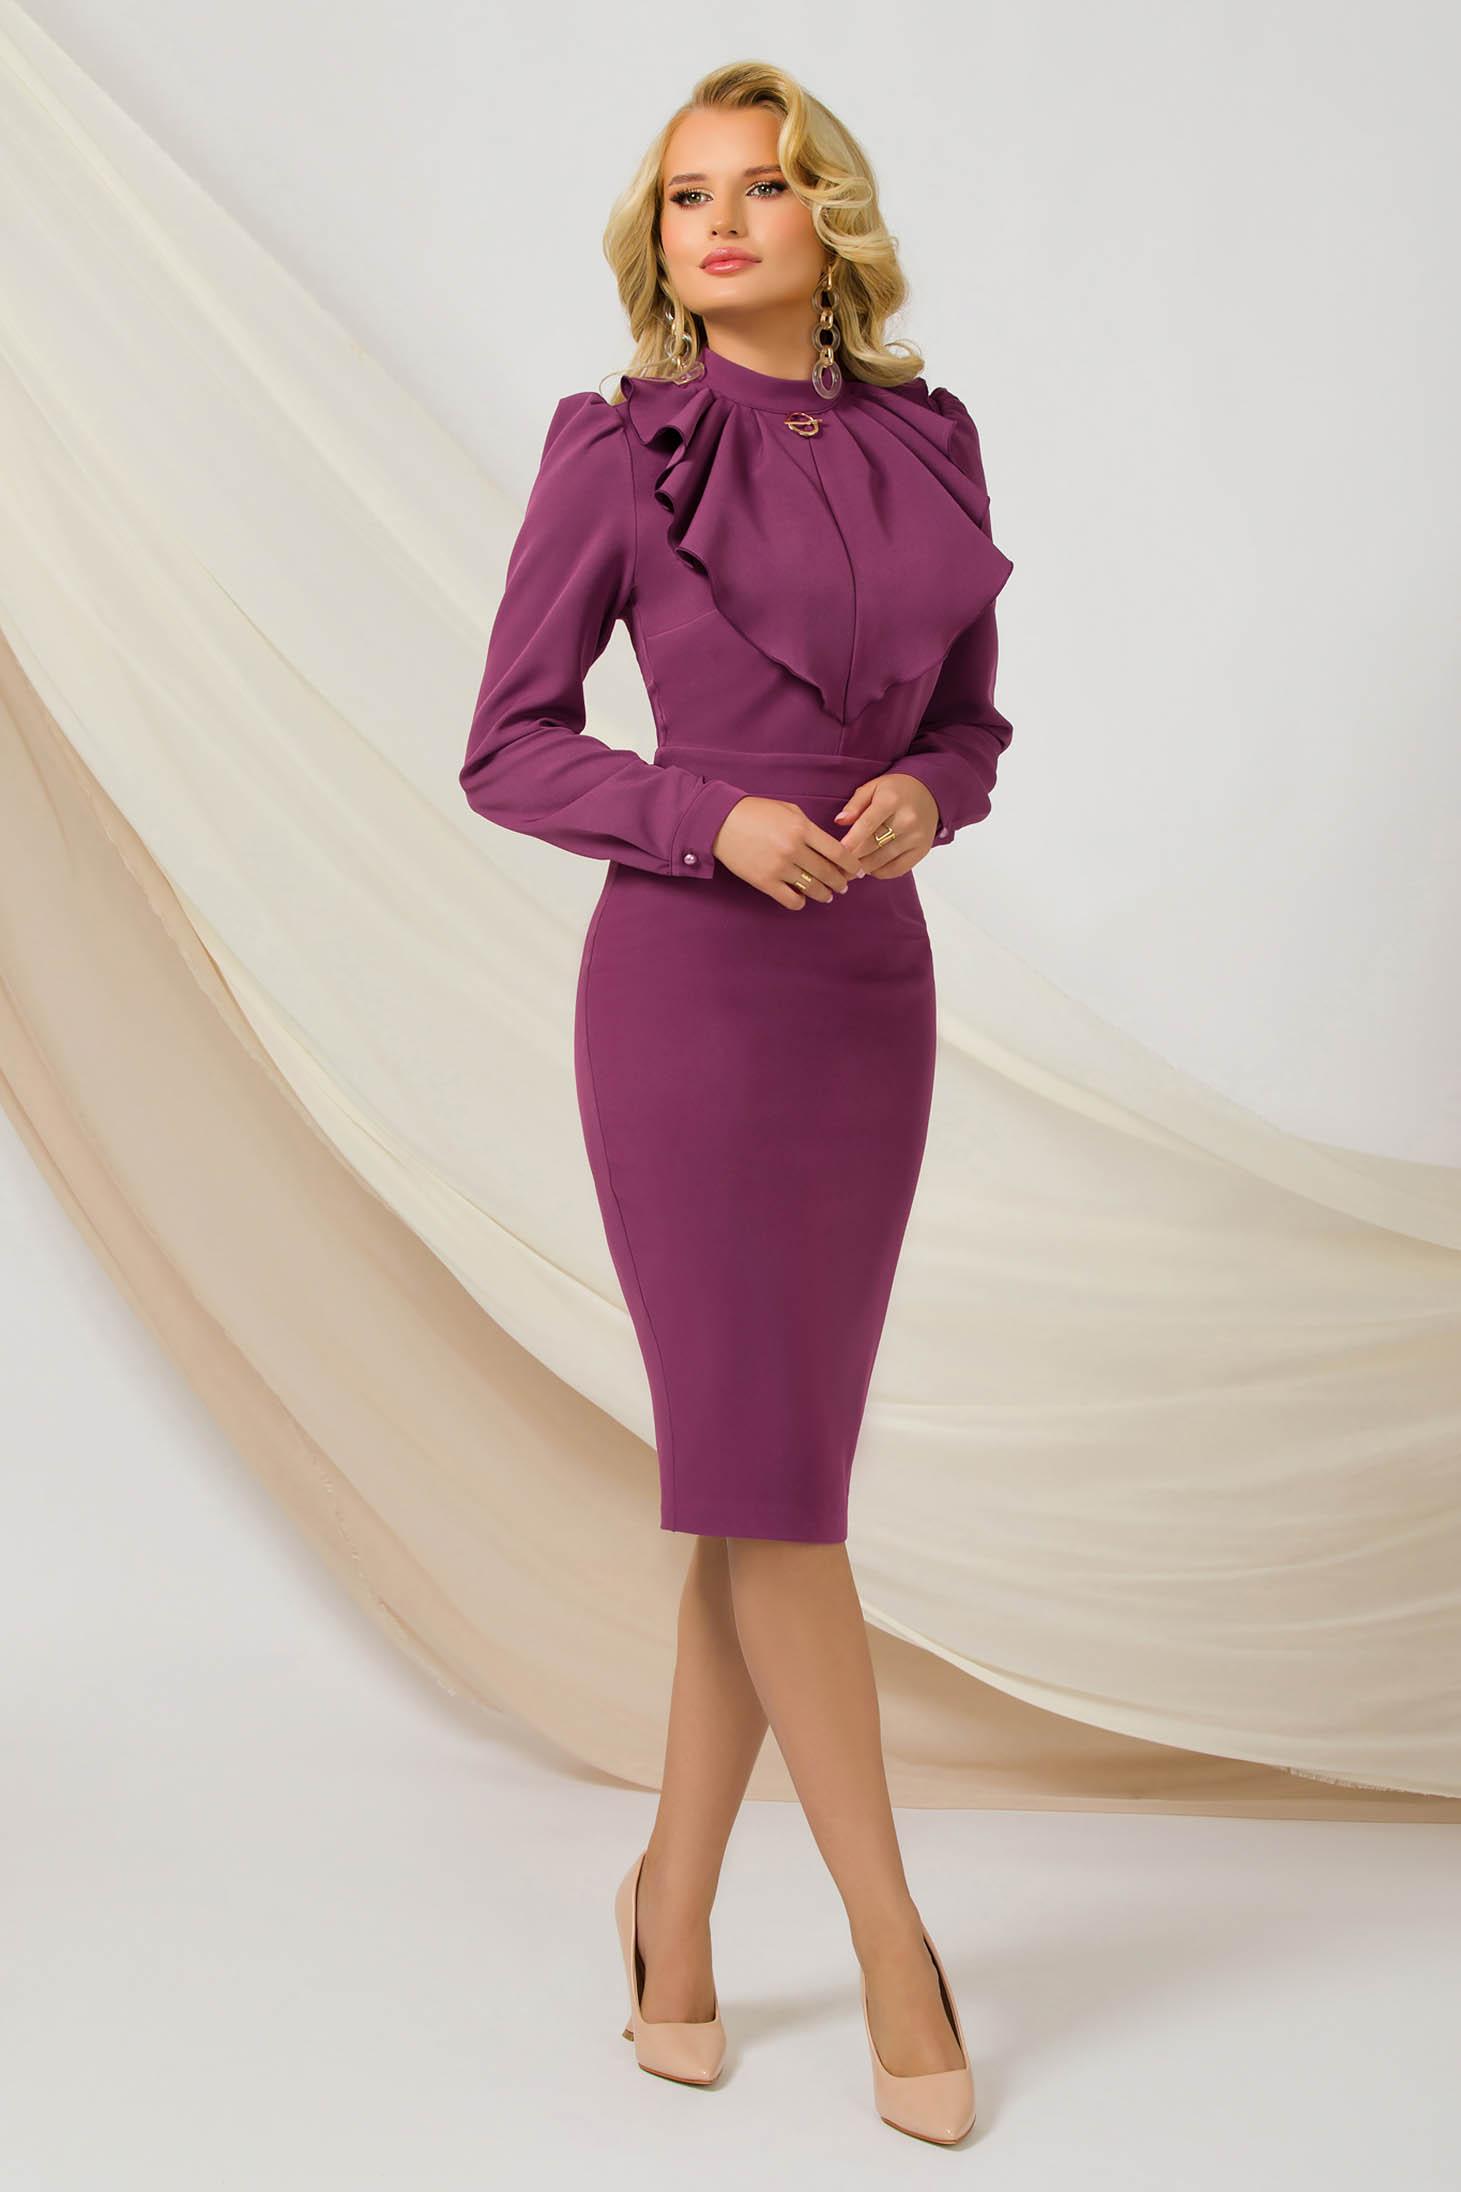 Purple dress midi pencil thin fabric office slightly elastic fabric accessorized with breastpin